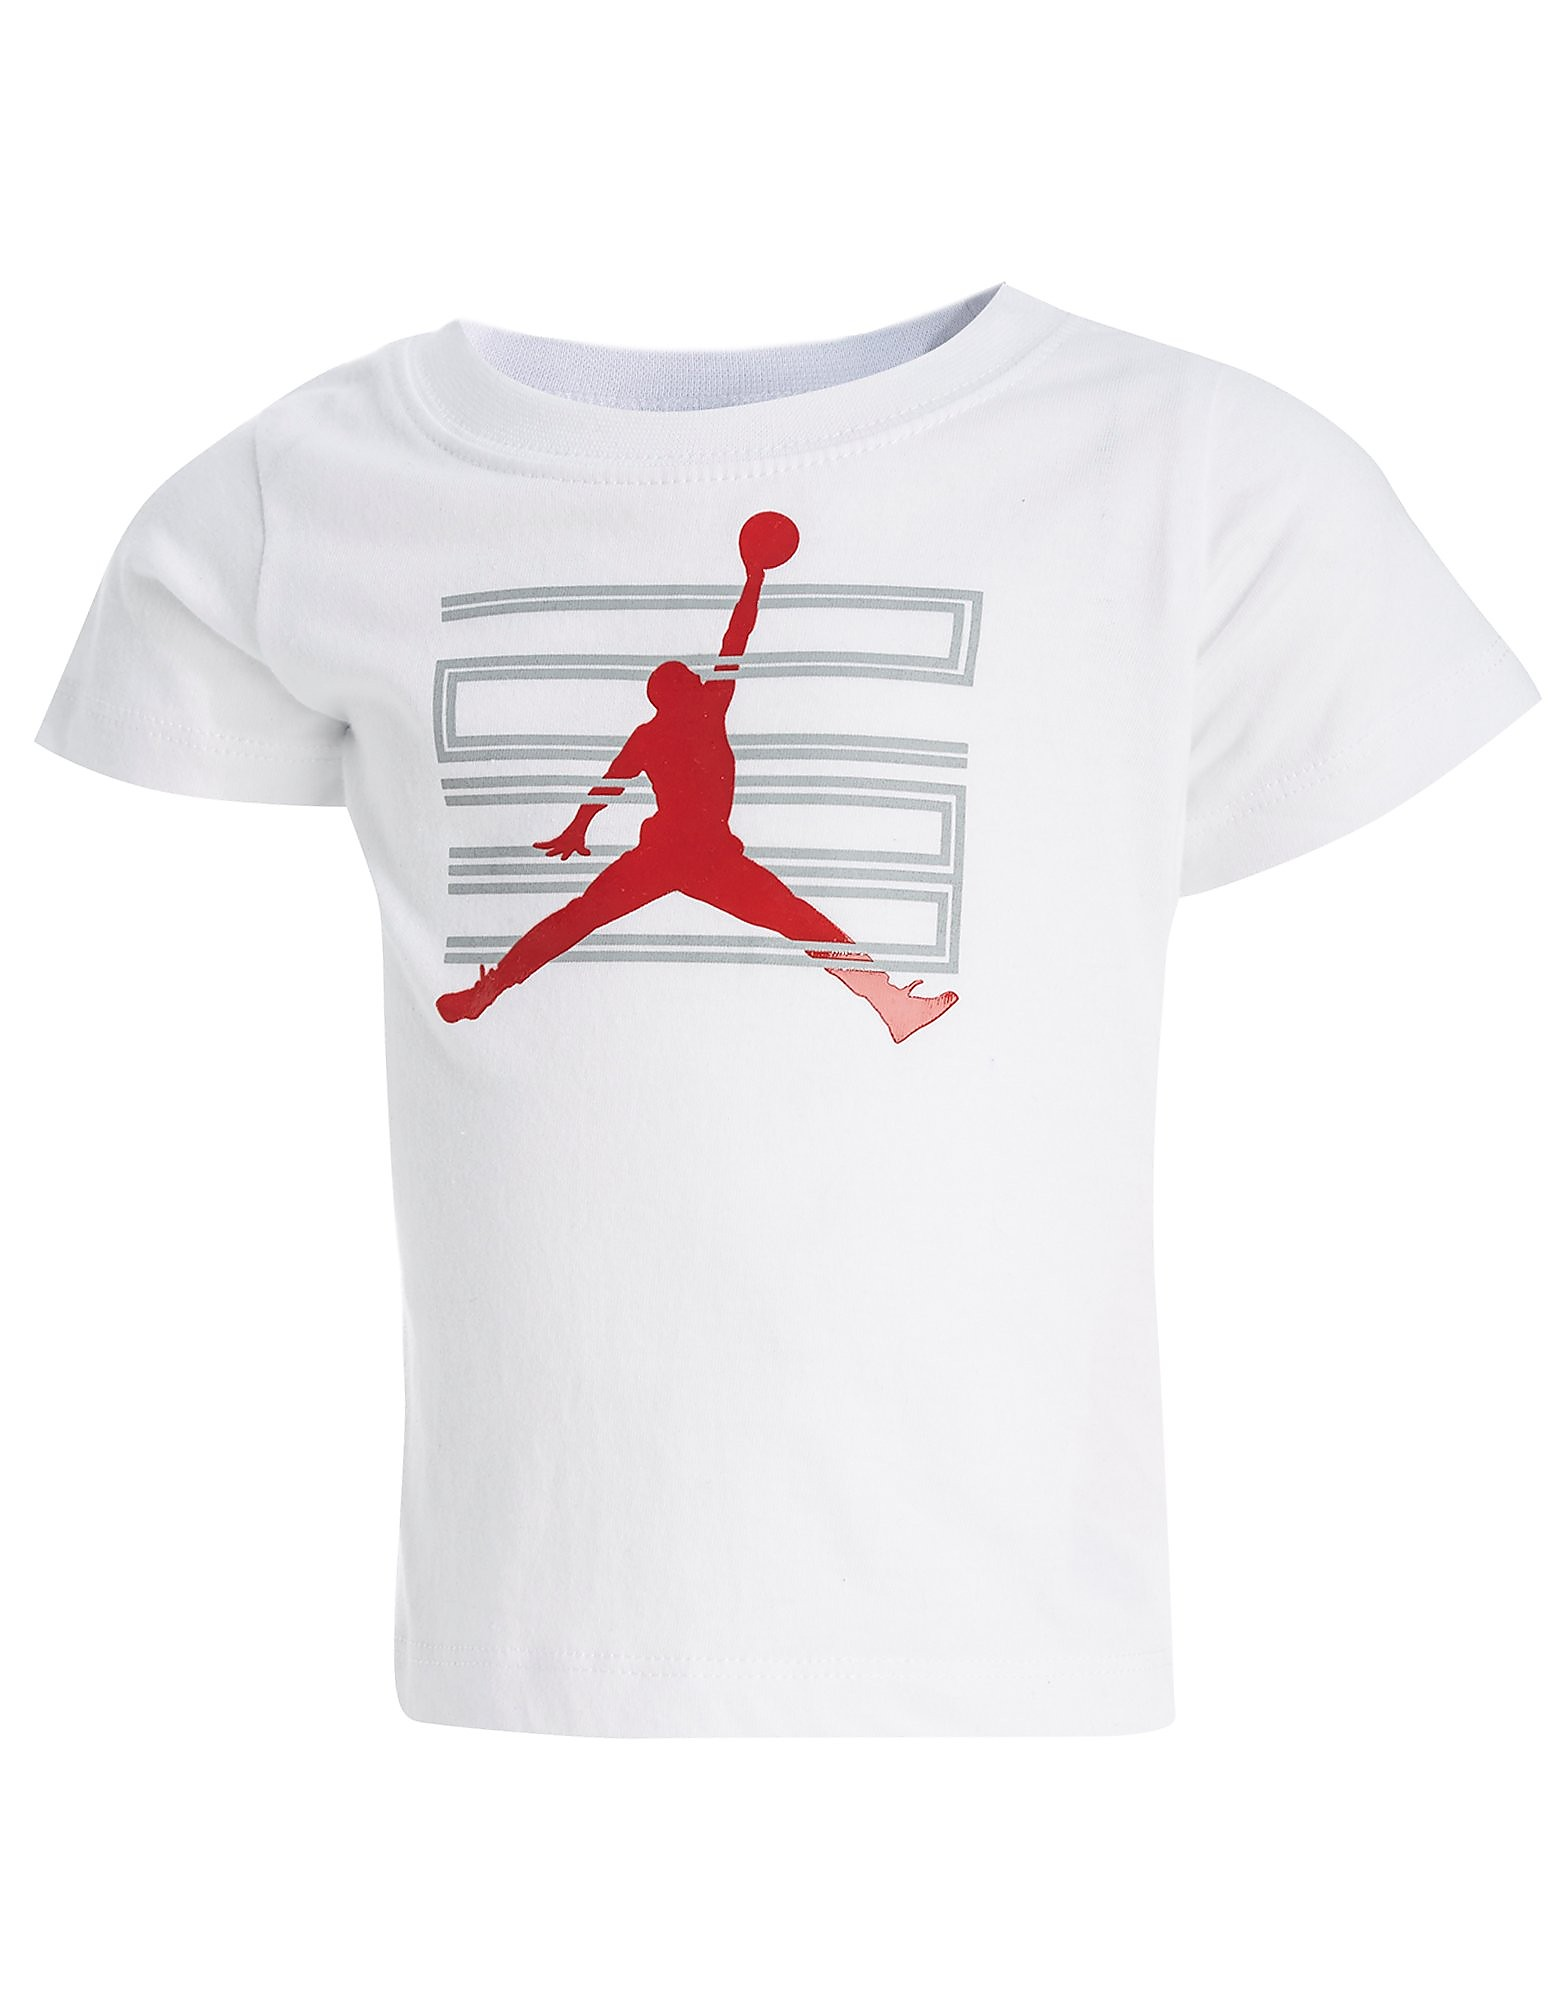 Jordan Air 11 T-Shirt Baby's - Wit - Kind